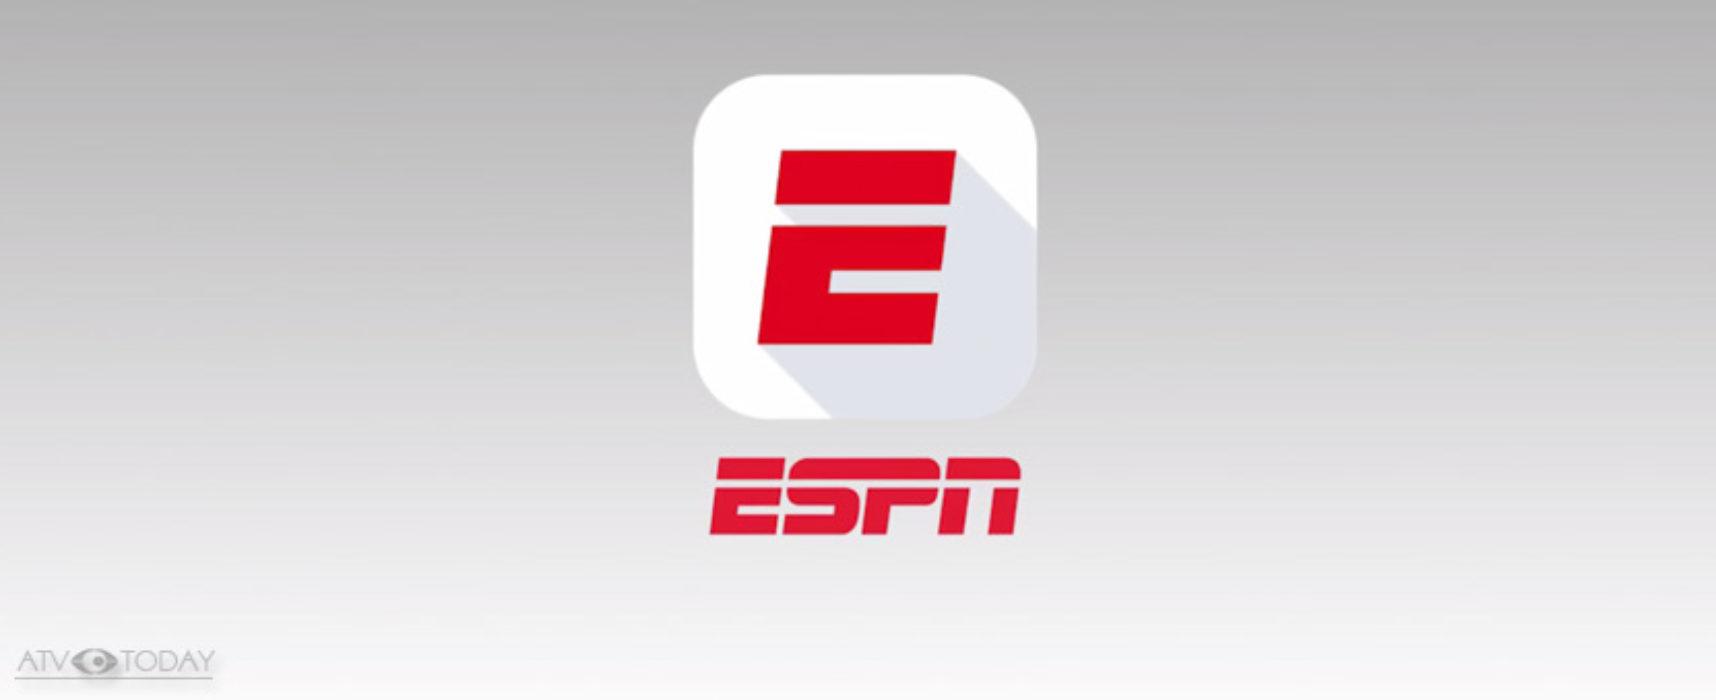 ESPN and MLB expand partnership